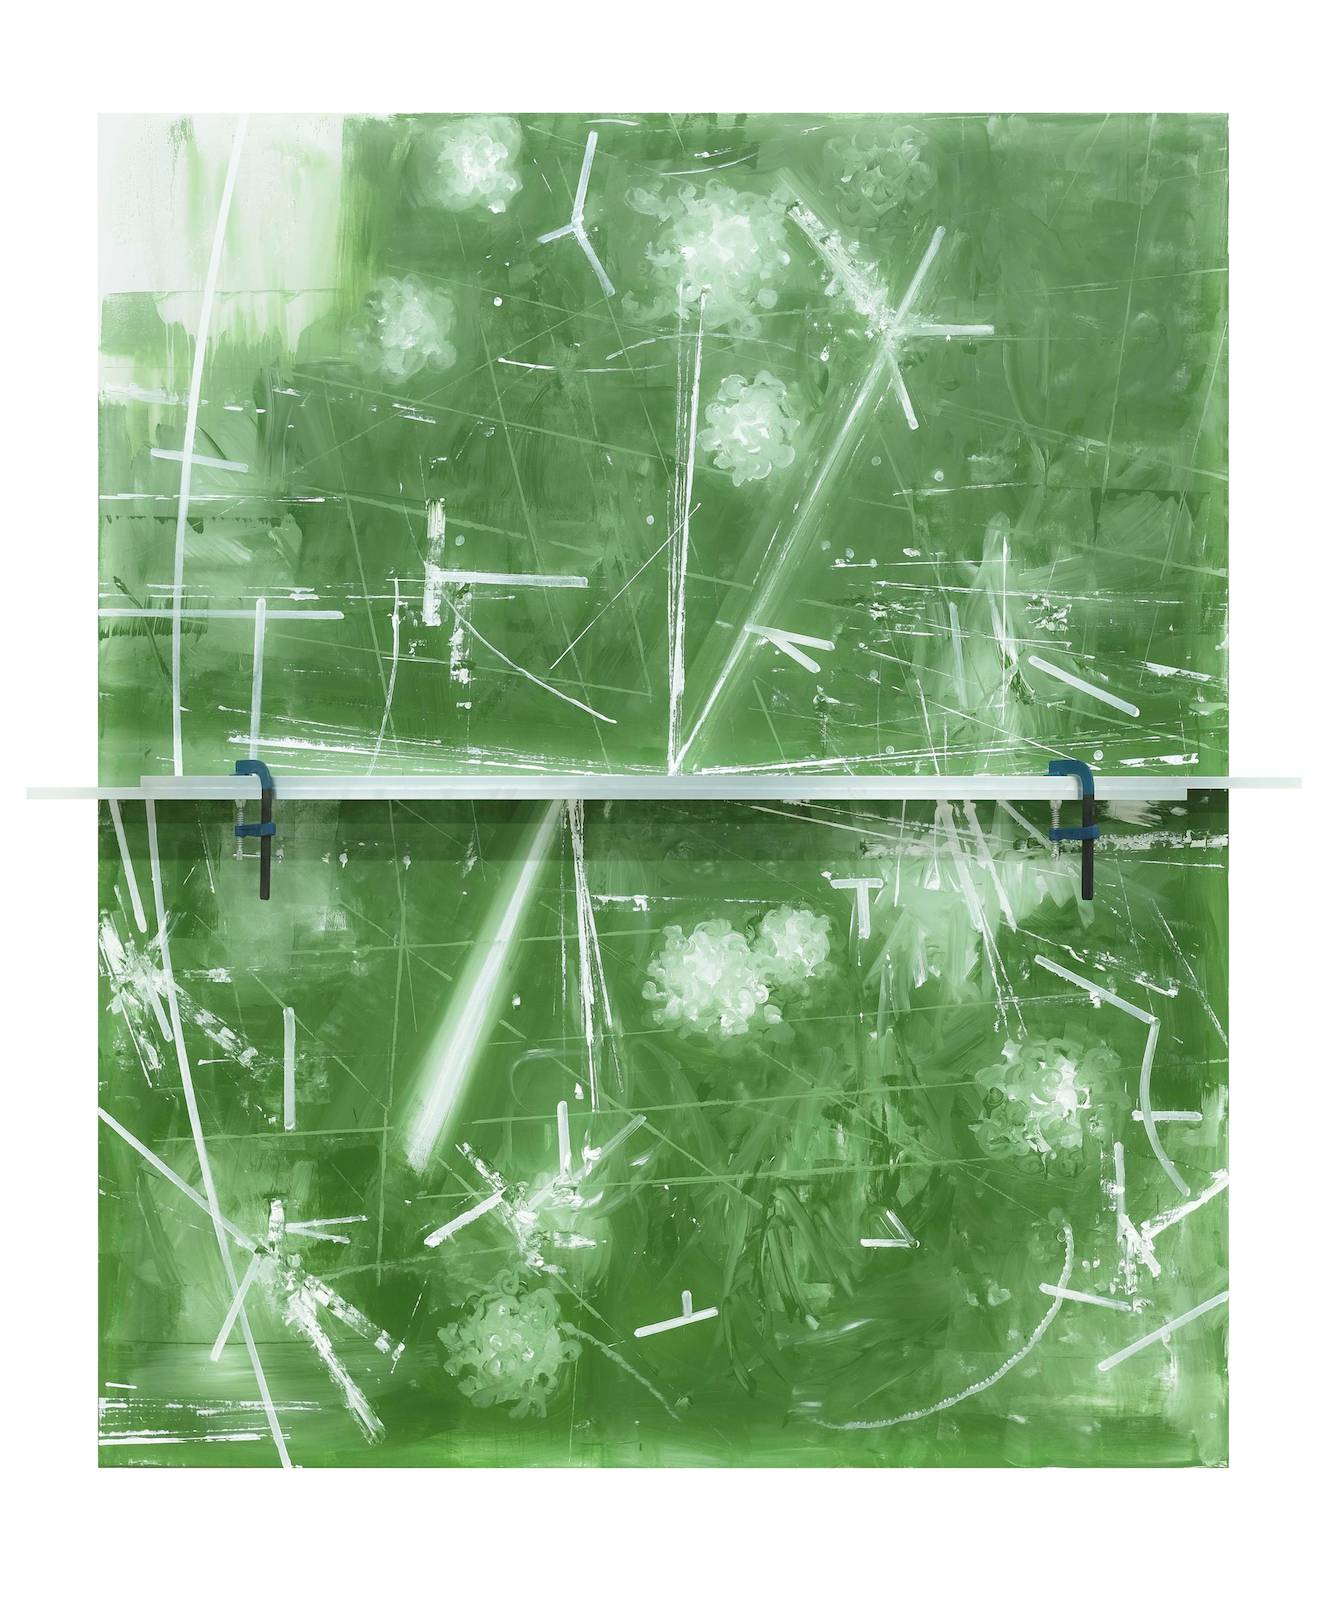 Untitled, 2016, acrylic on canvas, aluminum profile, screw clamps, 240 x 220 x 18,5 cm